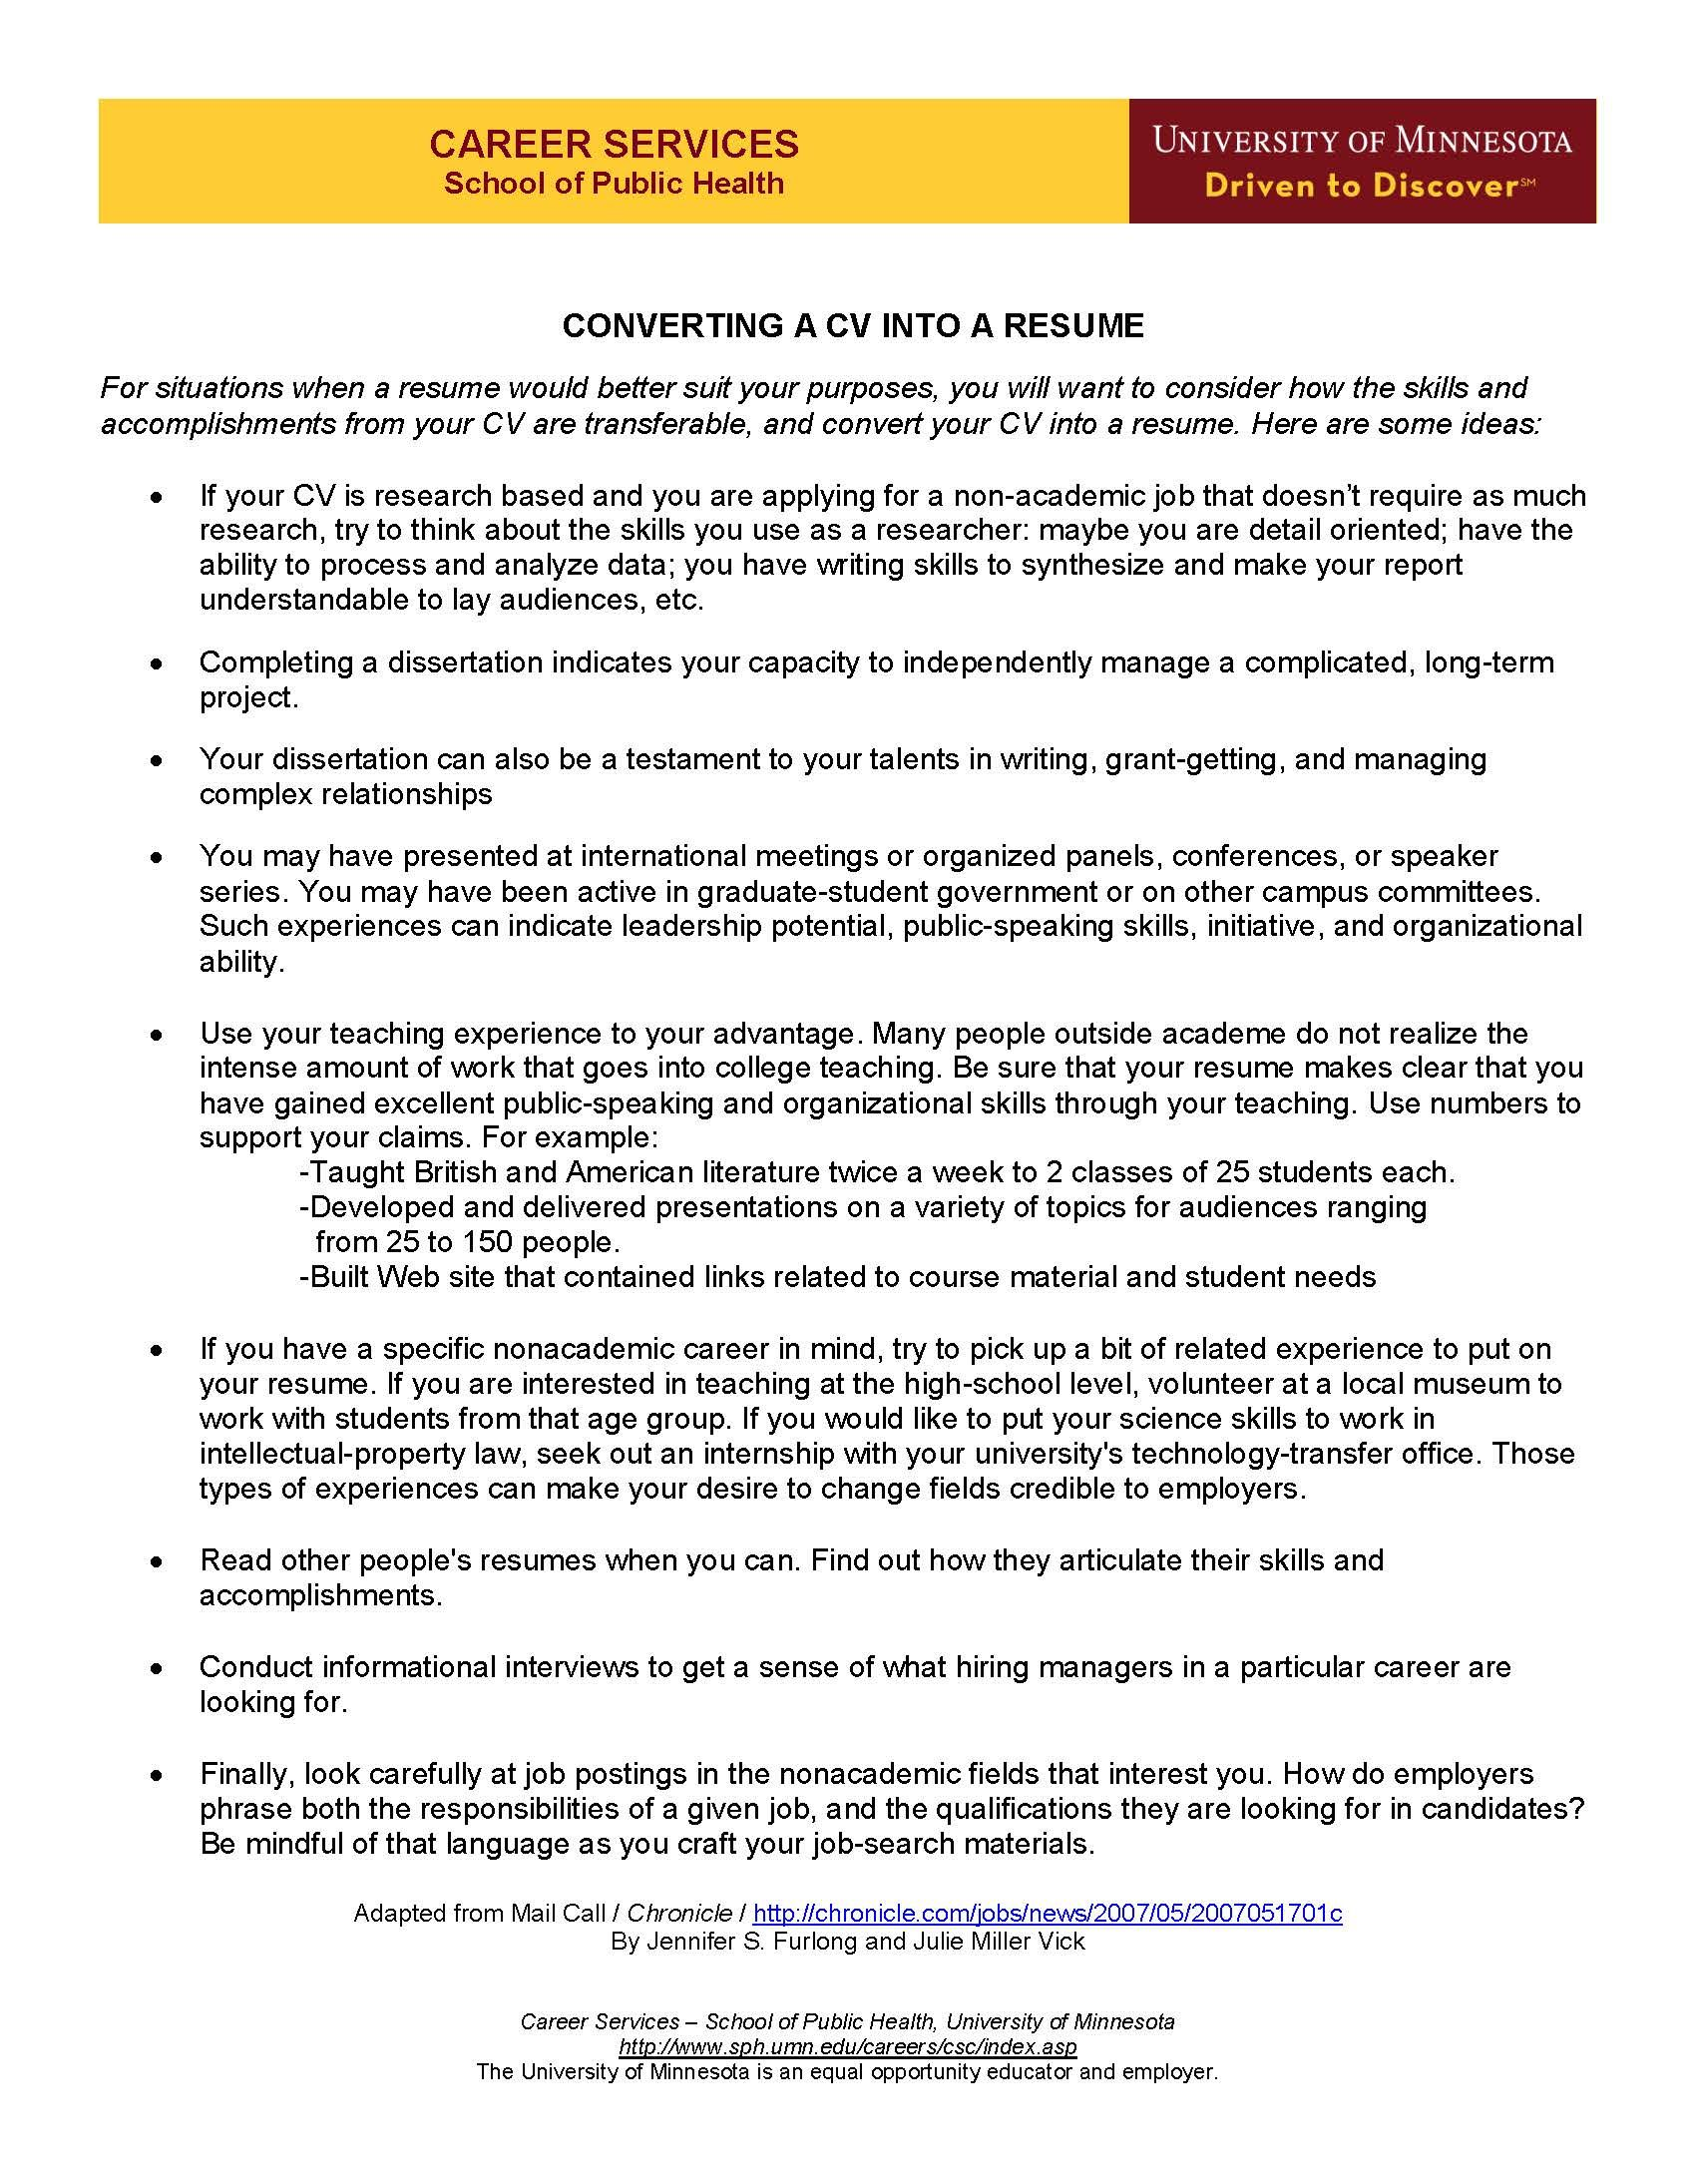 Converting a cv into a resume school health university